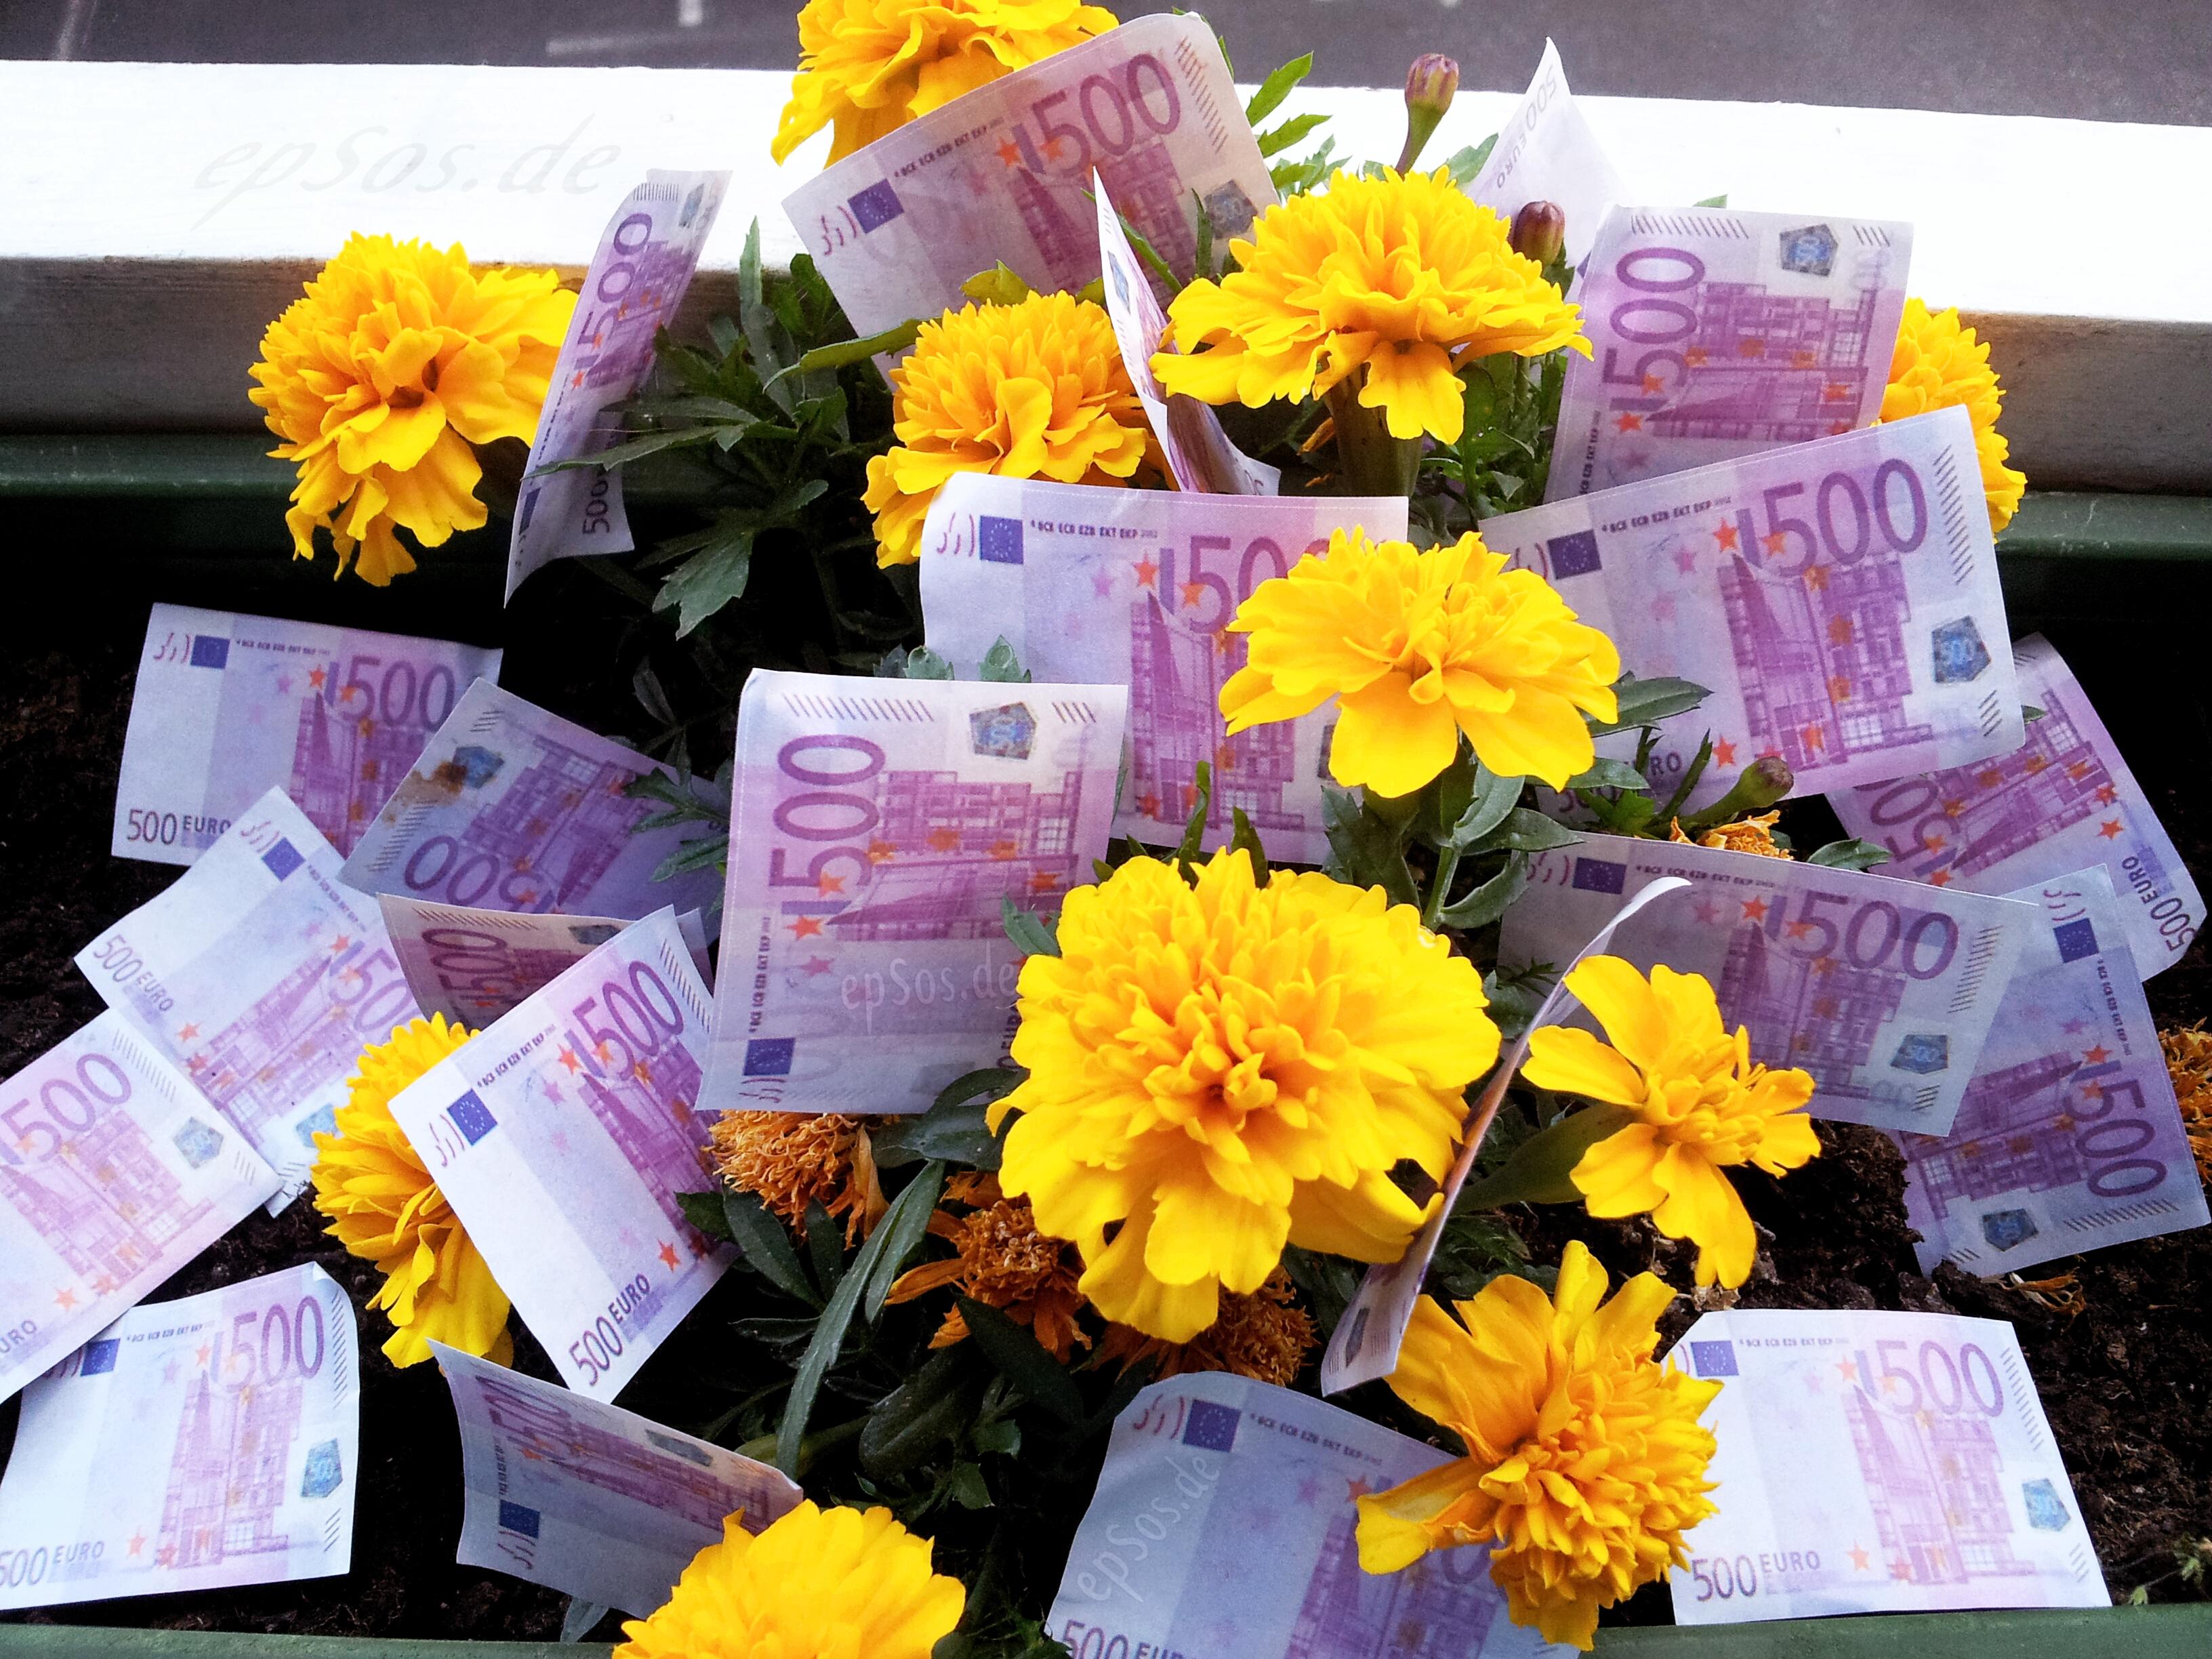 File:Growing Free Money on Flowers.jpg - Wikimedia Commons